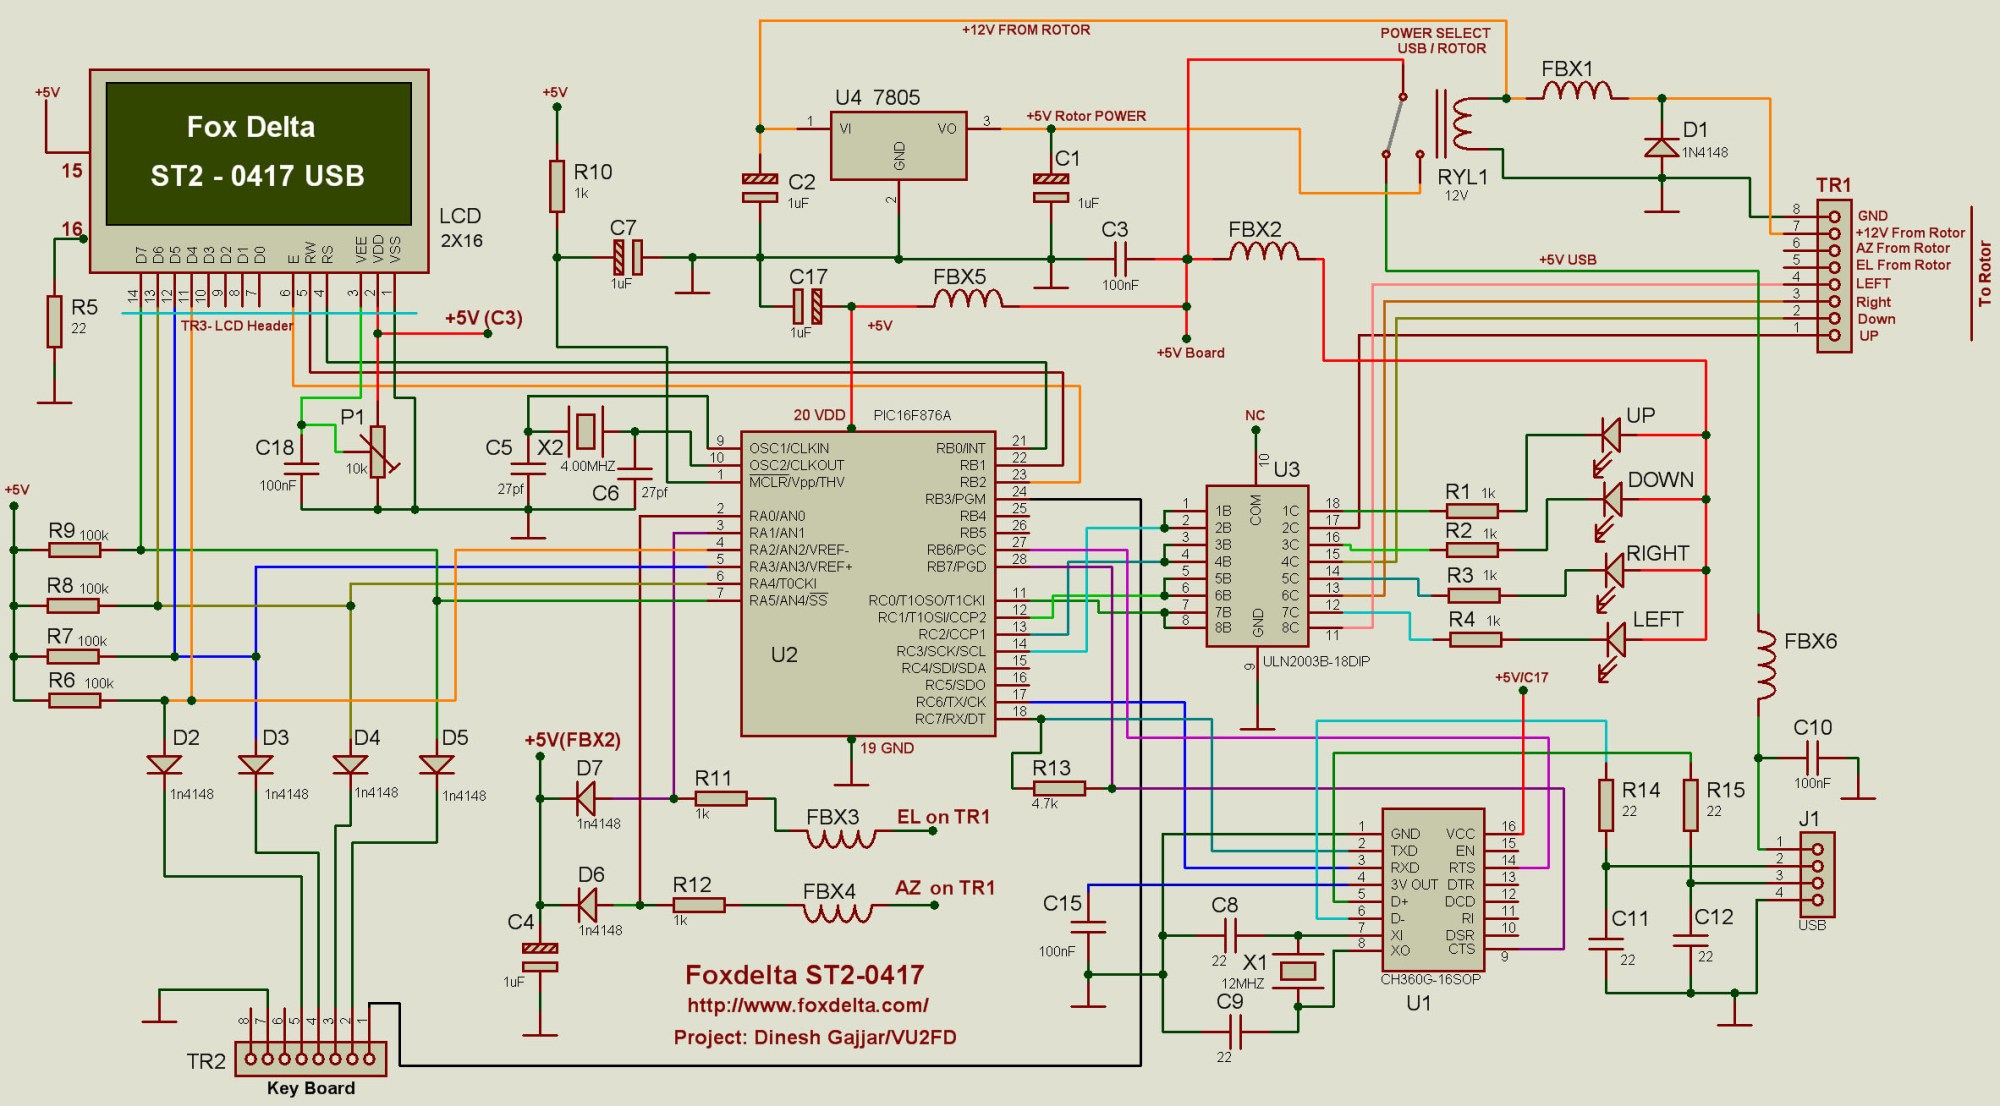 hight resolution of st2 0417 0318 schematic